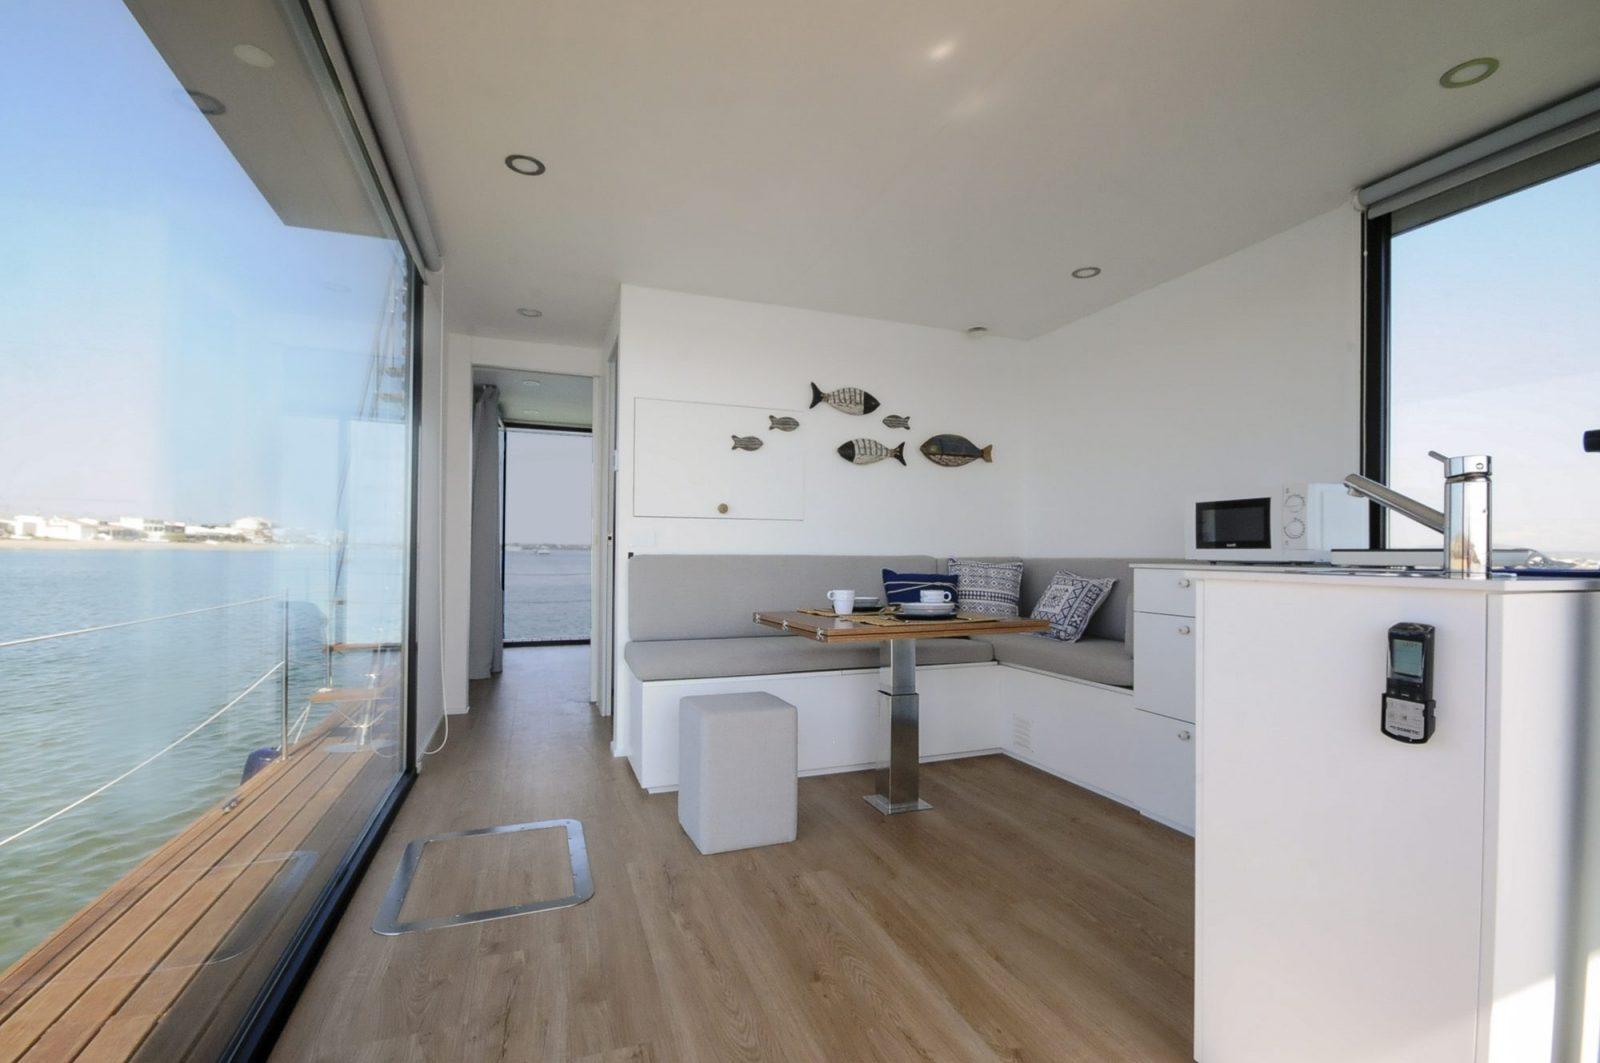 Sala - Alojamento barco casa na Ria Formosa, Faro, Algarve, Portugal